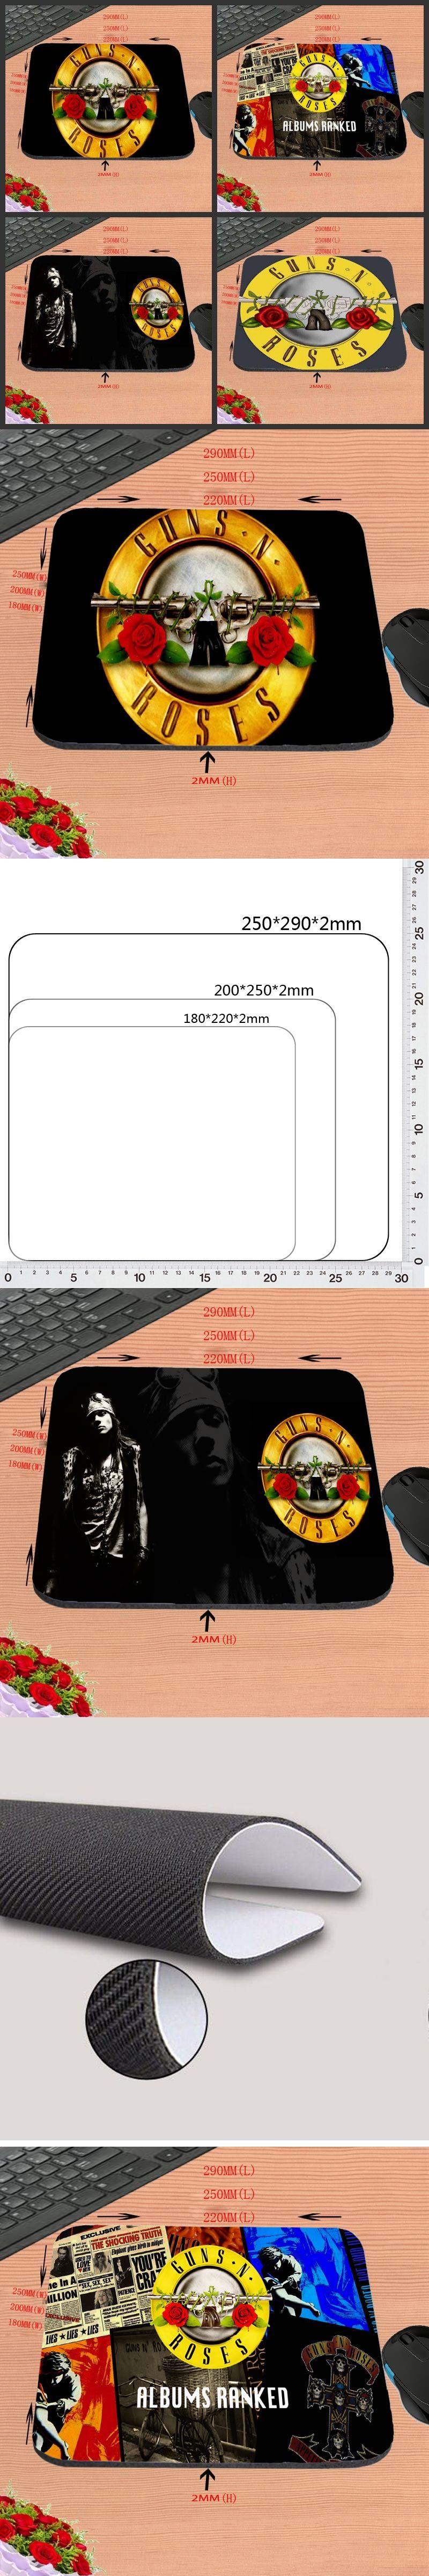 Promo Mousepad L200 Find Indonesia Update 2018 Quns N Roses Album Hot Design Anti Slip Durable New Arrival Customized